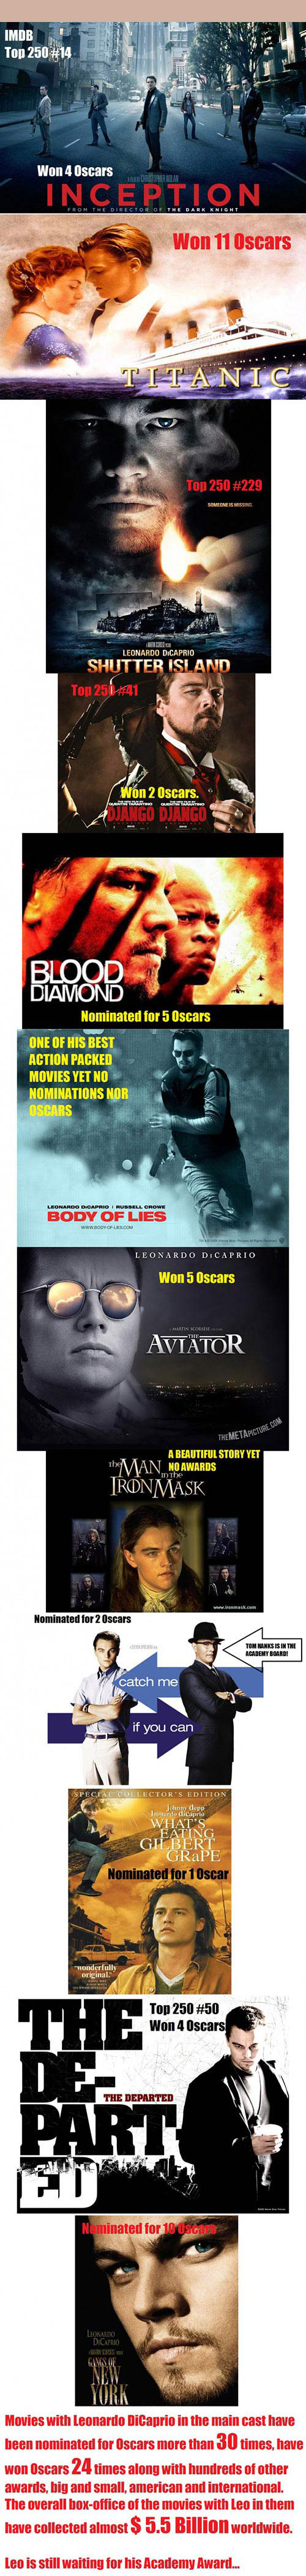 Leonardo DiCaprio's bad luck…